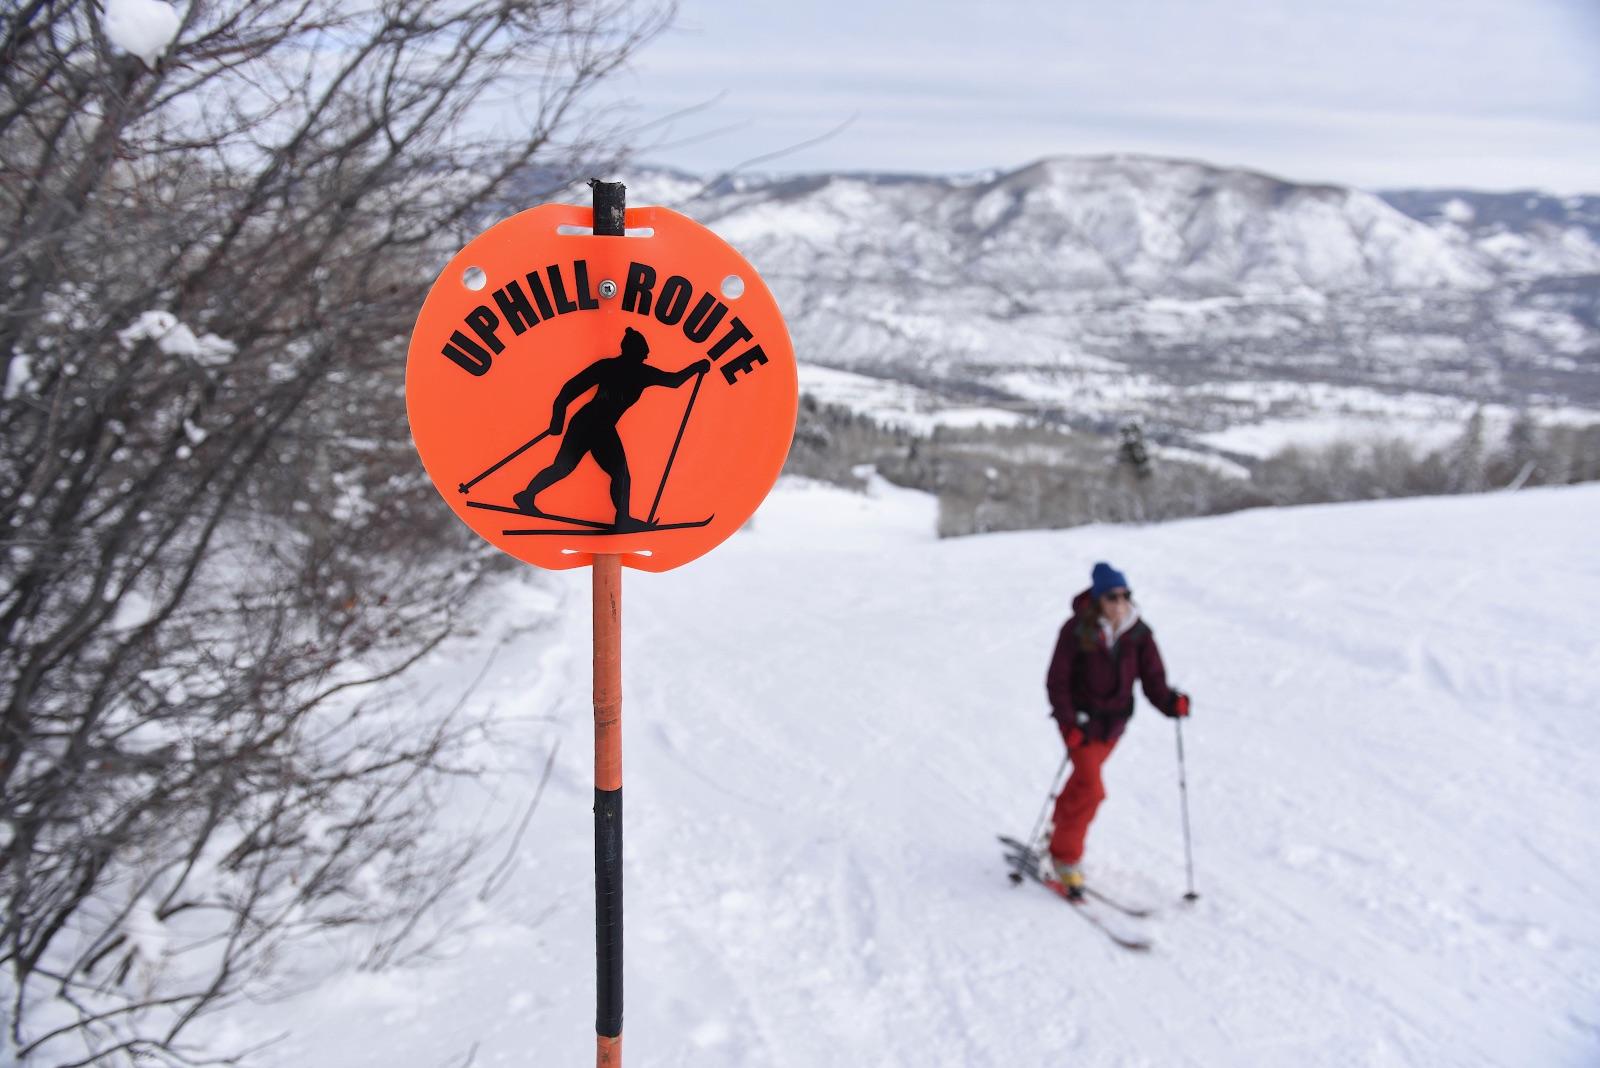 Skinning up a designated trail at Buttermilk Ski Resort in Colorado